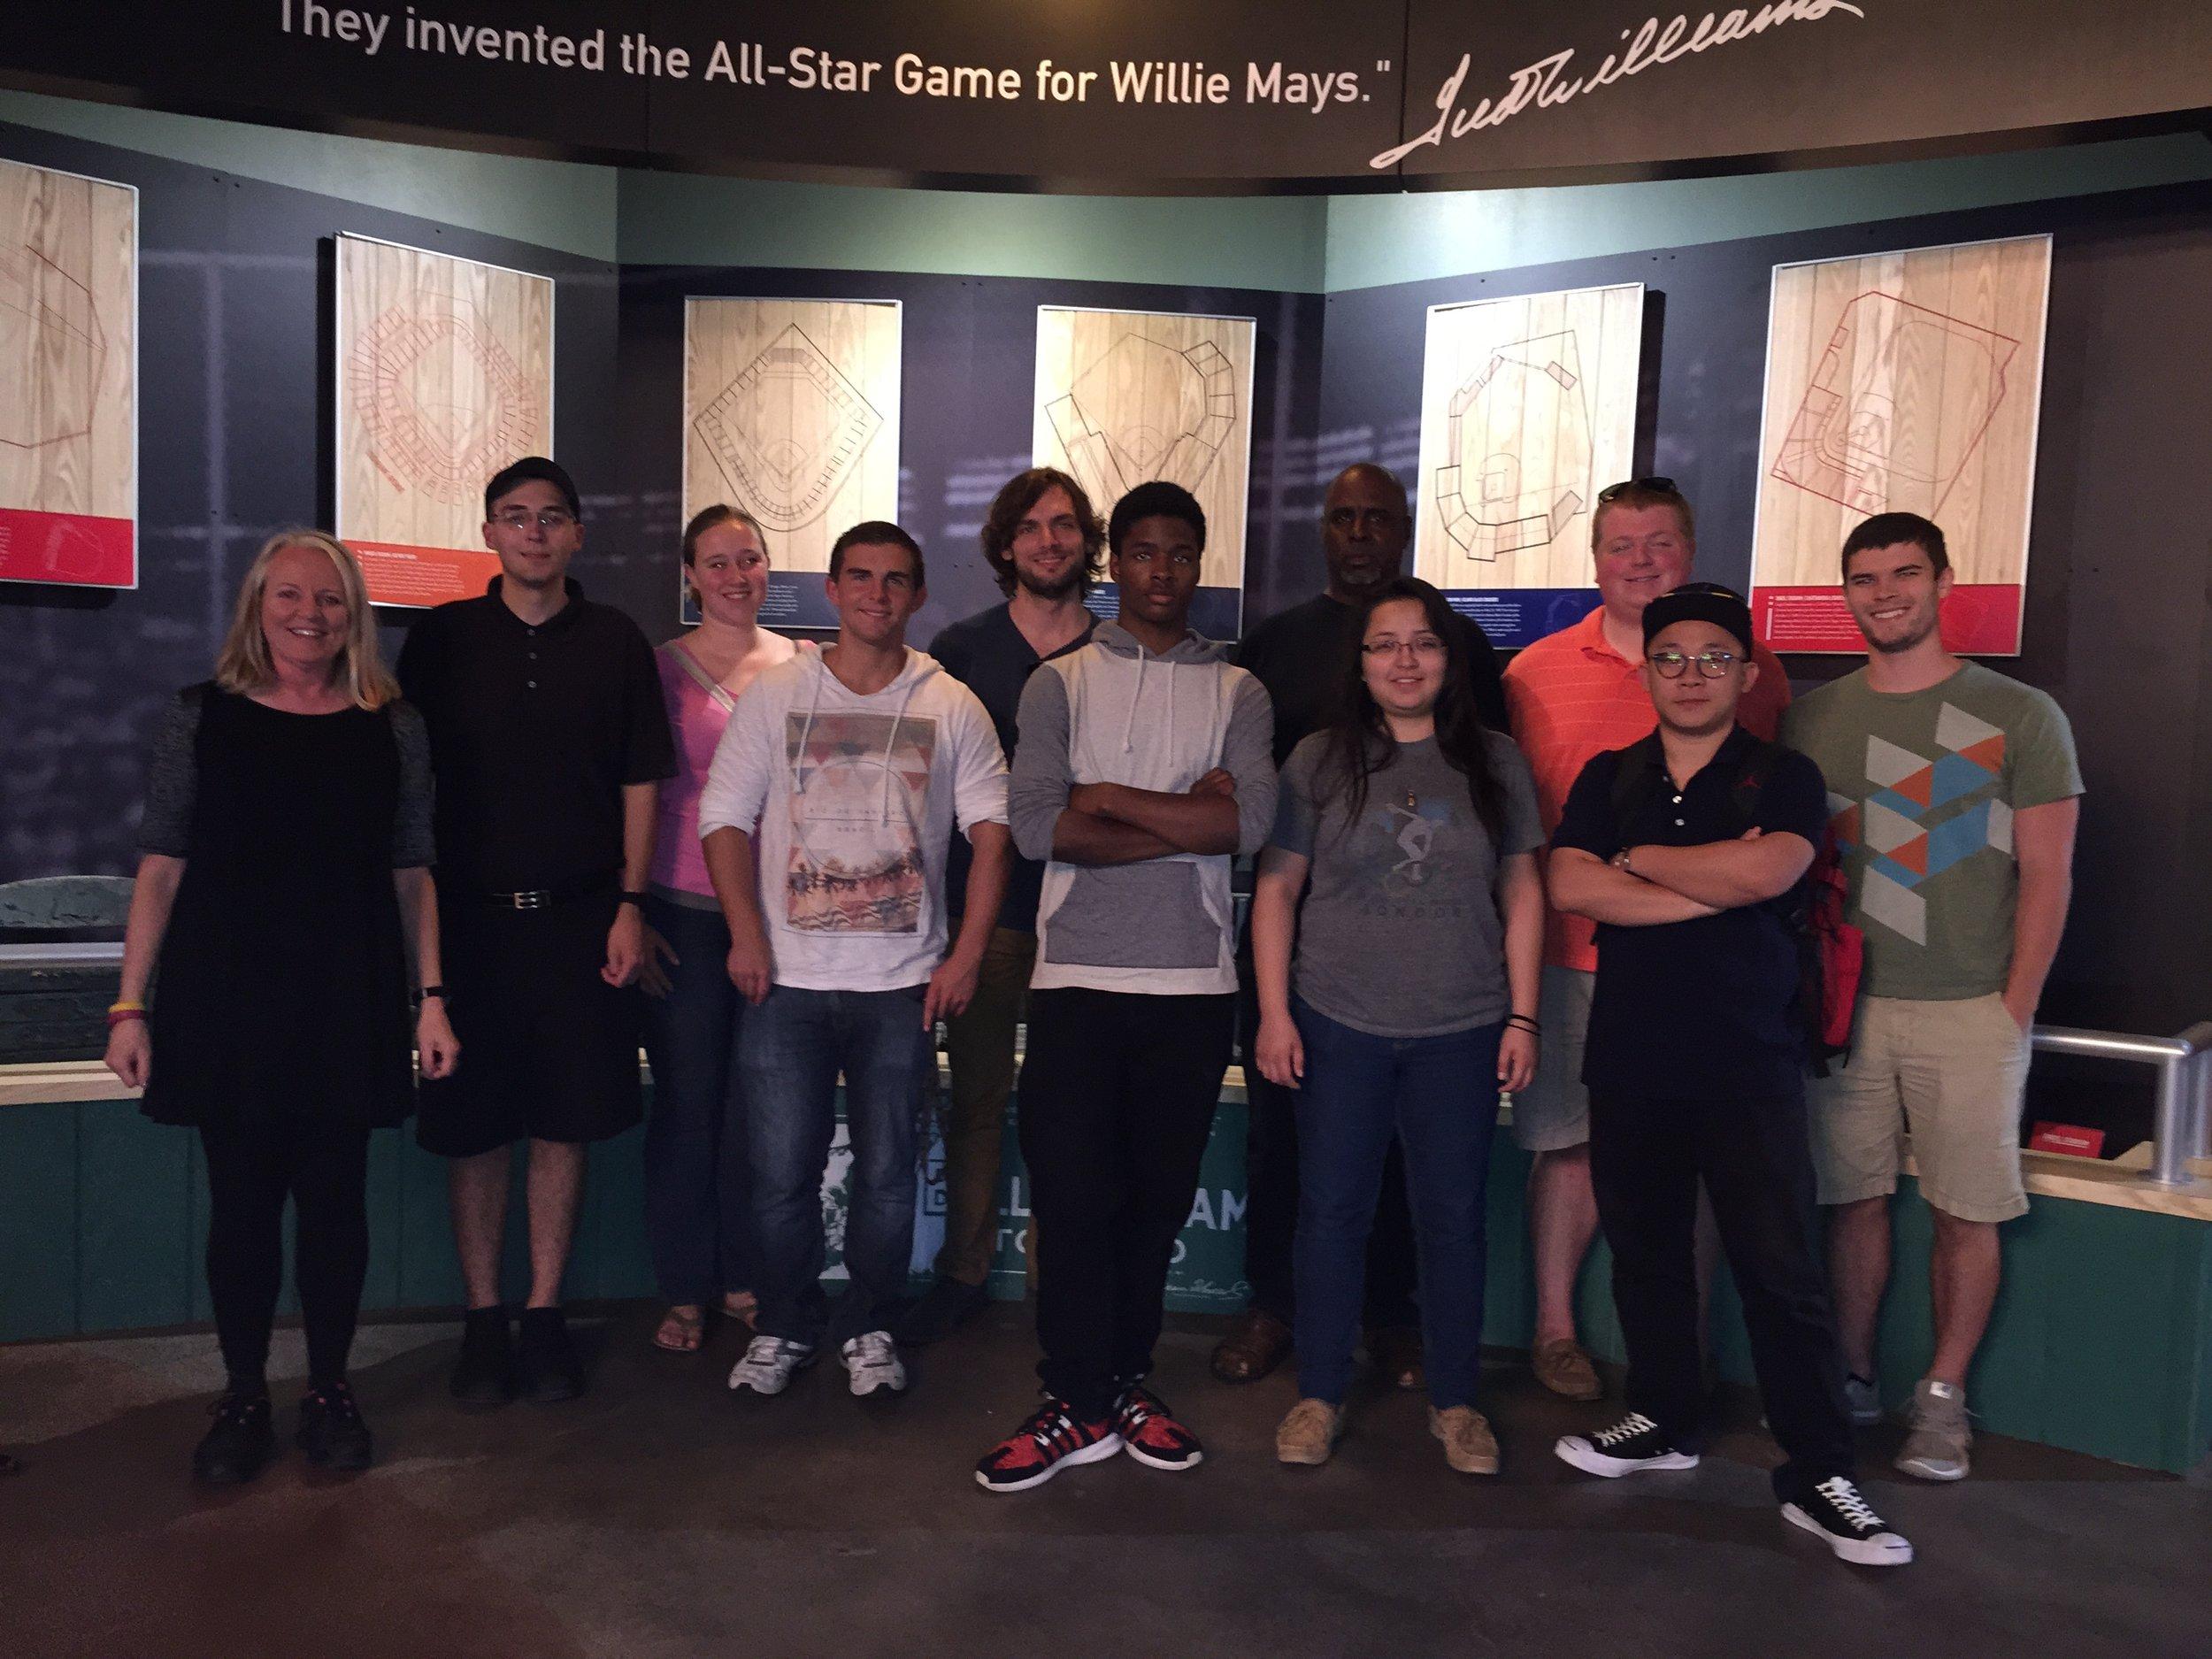 ARCH594-2015-Keddy-Group Photo_Negro Baseball Museuam.JPG